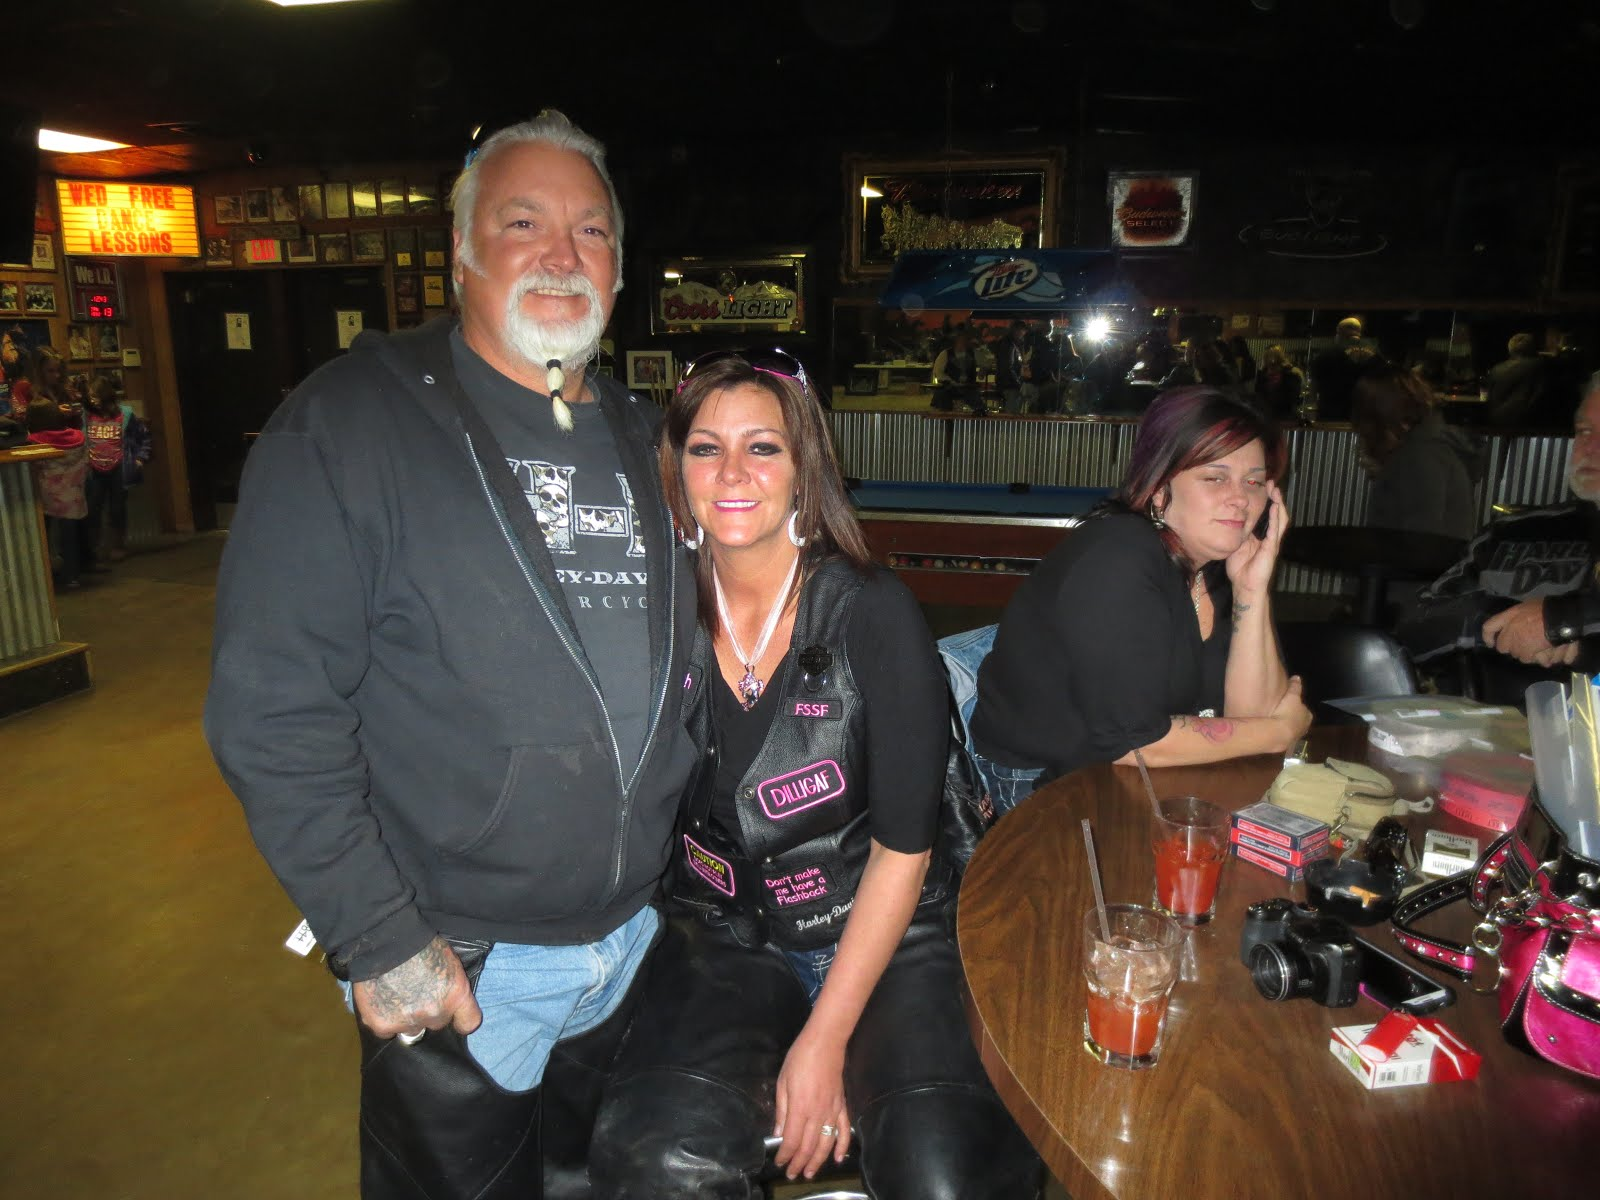 North texas bikers v fssf benefit run for ope 1 13 2012 for Tattoo shops in wichita falls tx